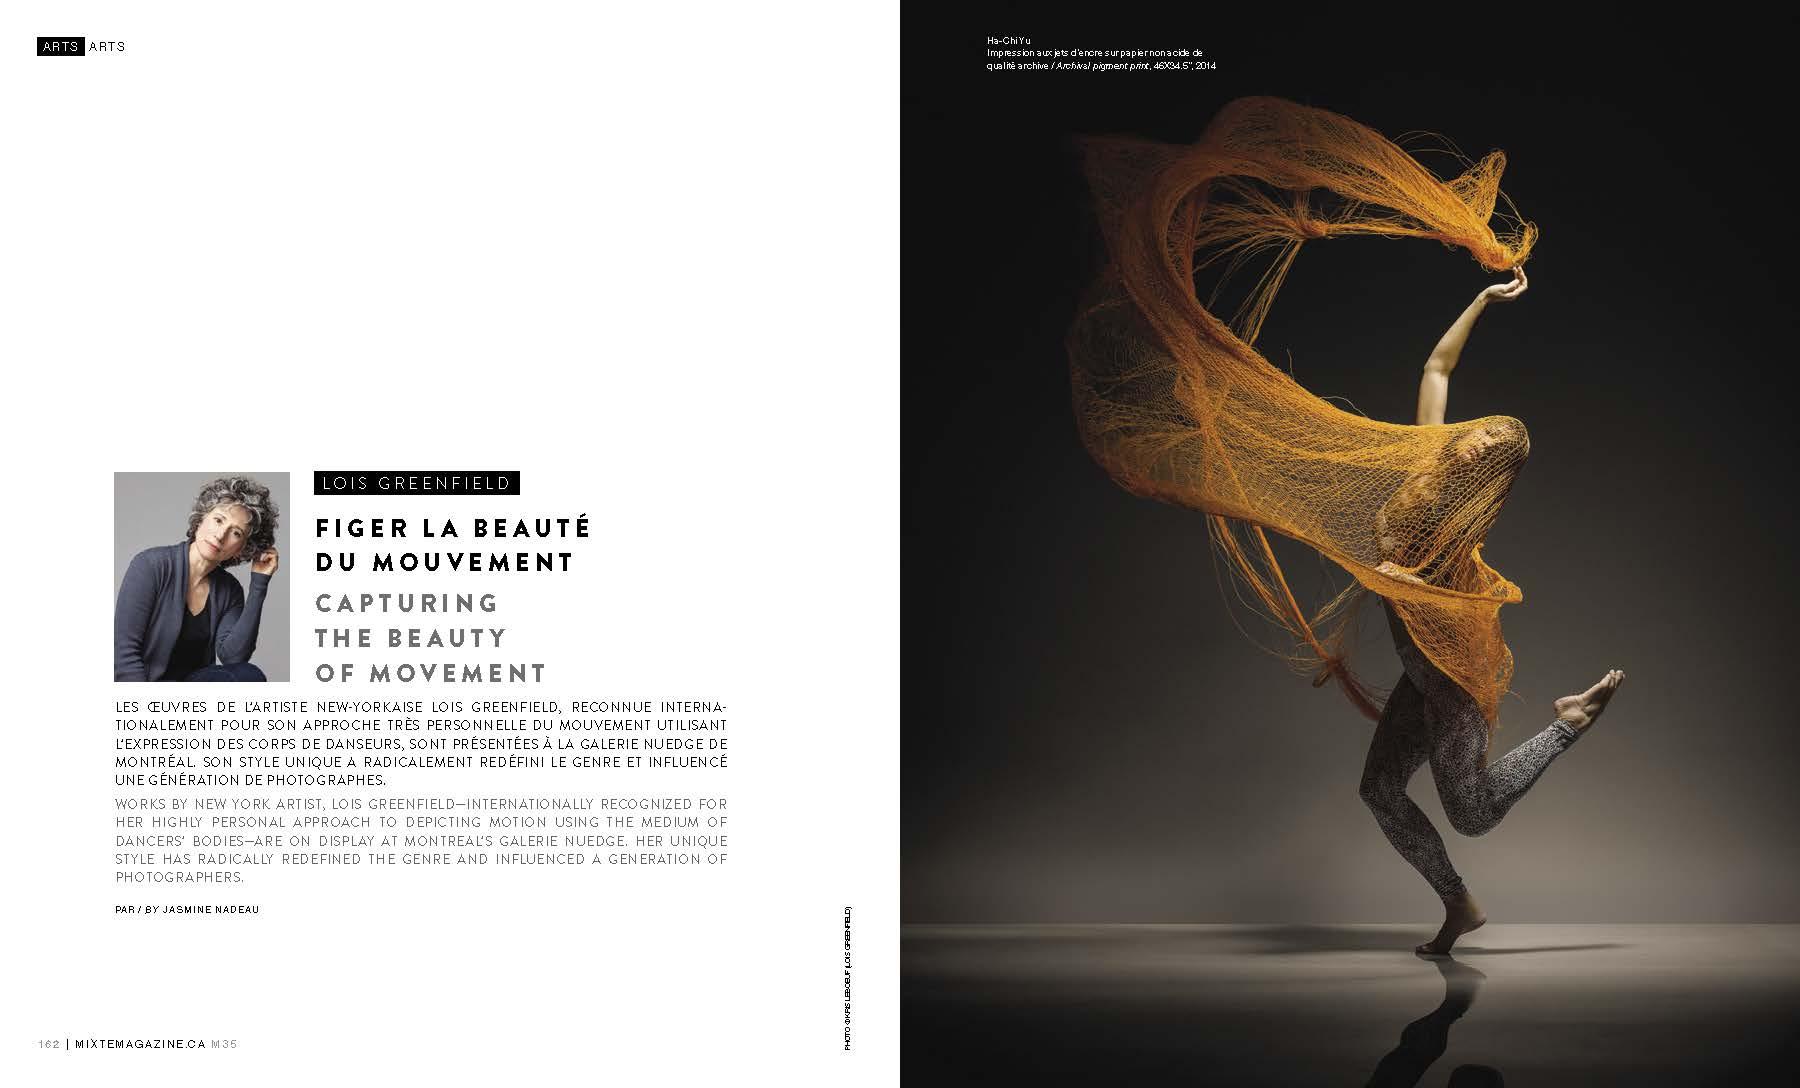 Mixte Magazine-Lois Greefield_Page_1.jpg